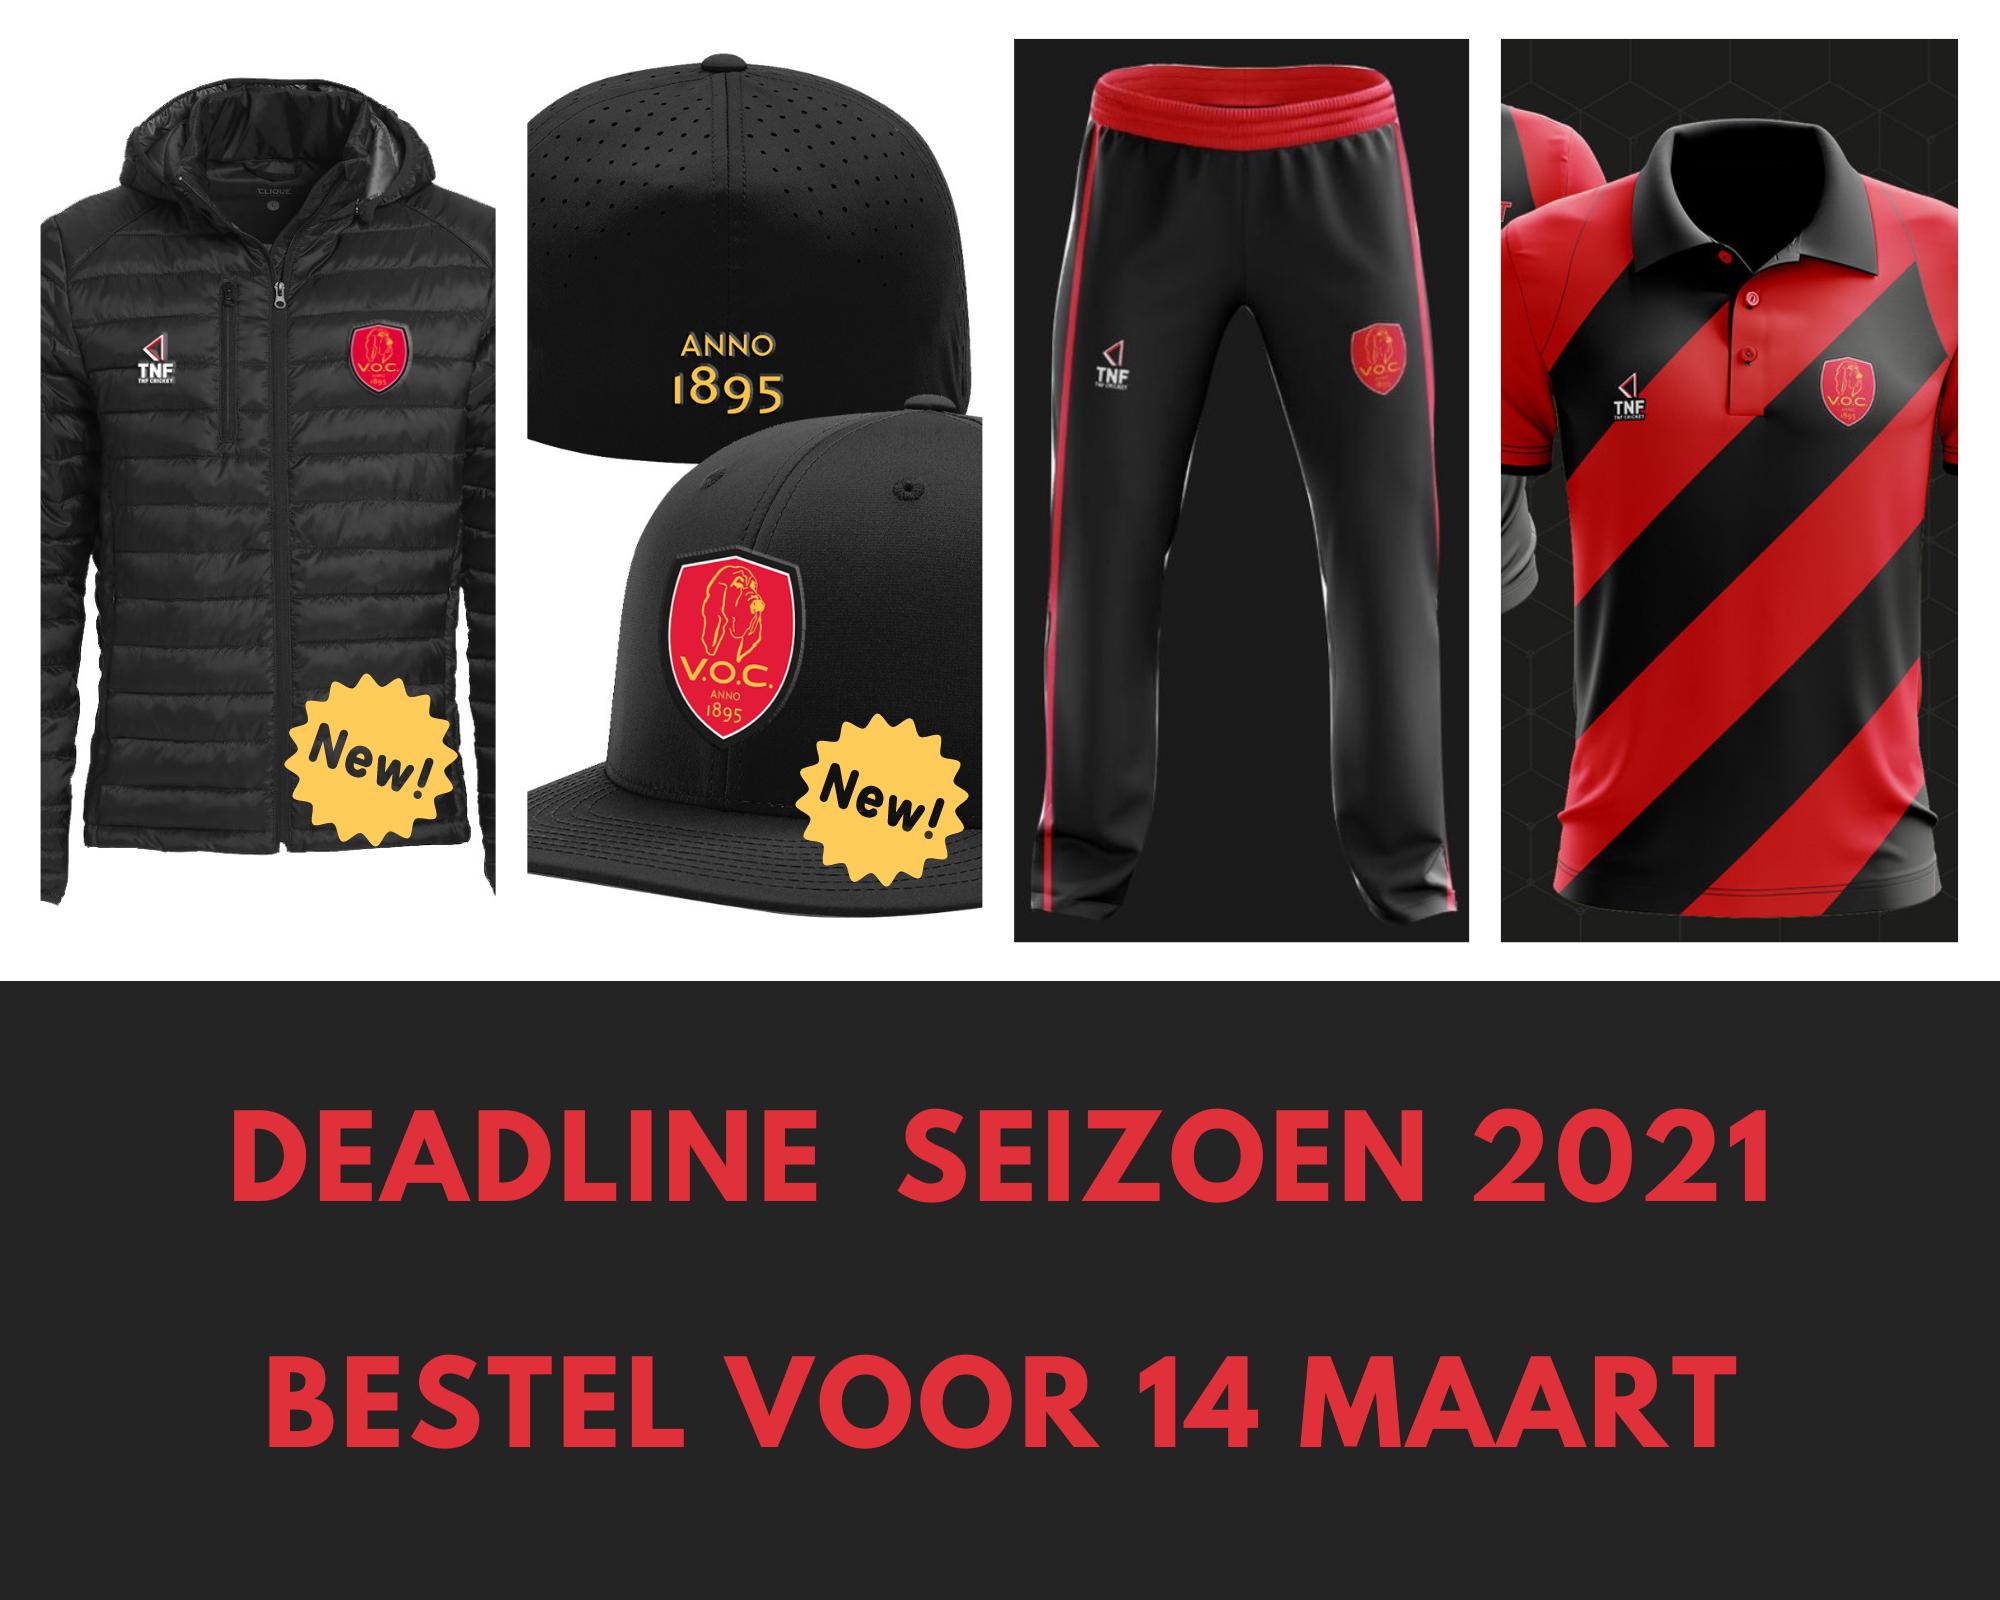 Cricket kleding bestellen tot 14 maart